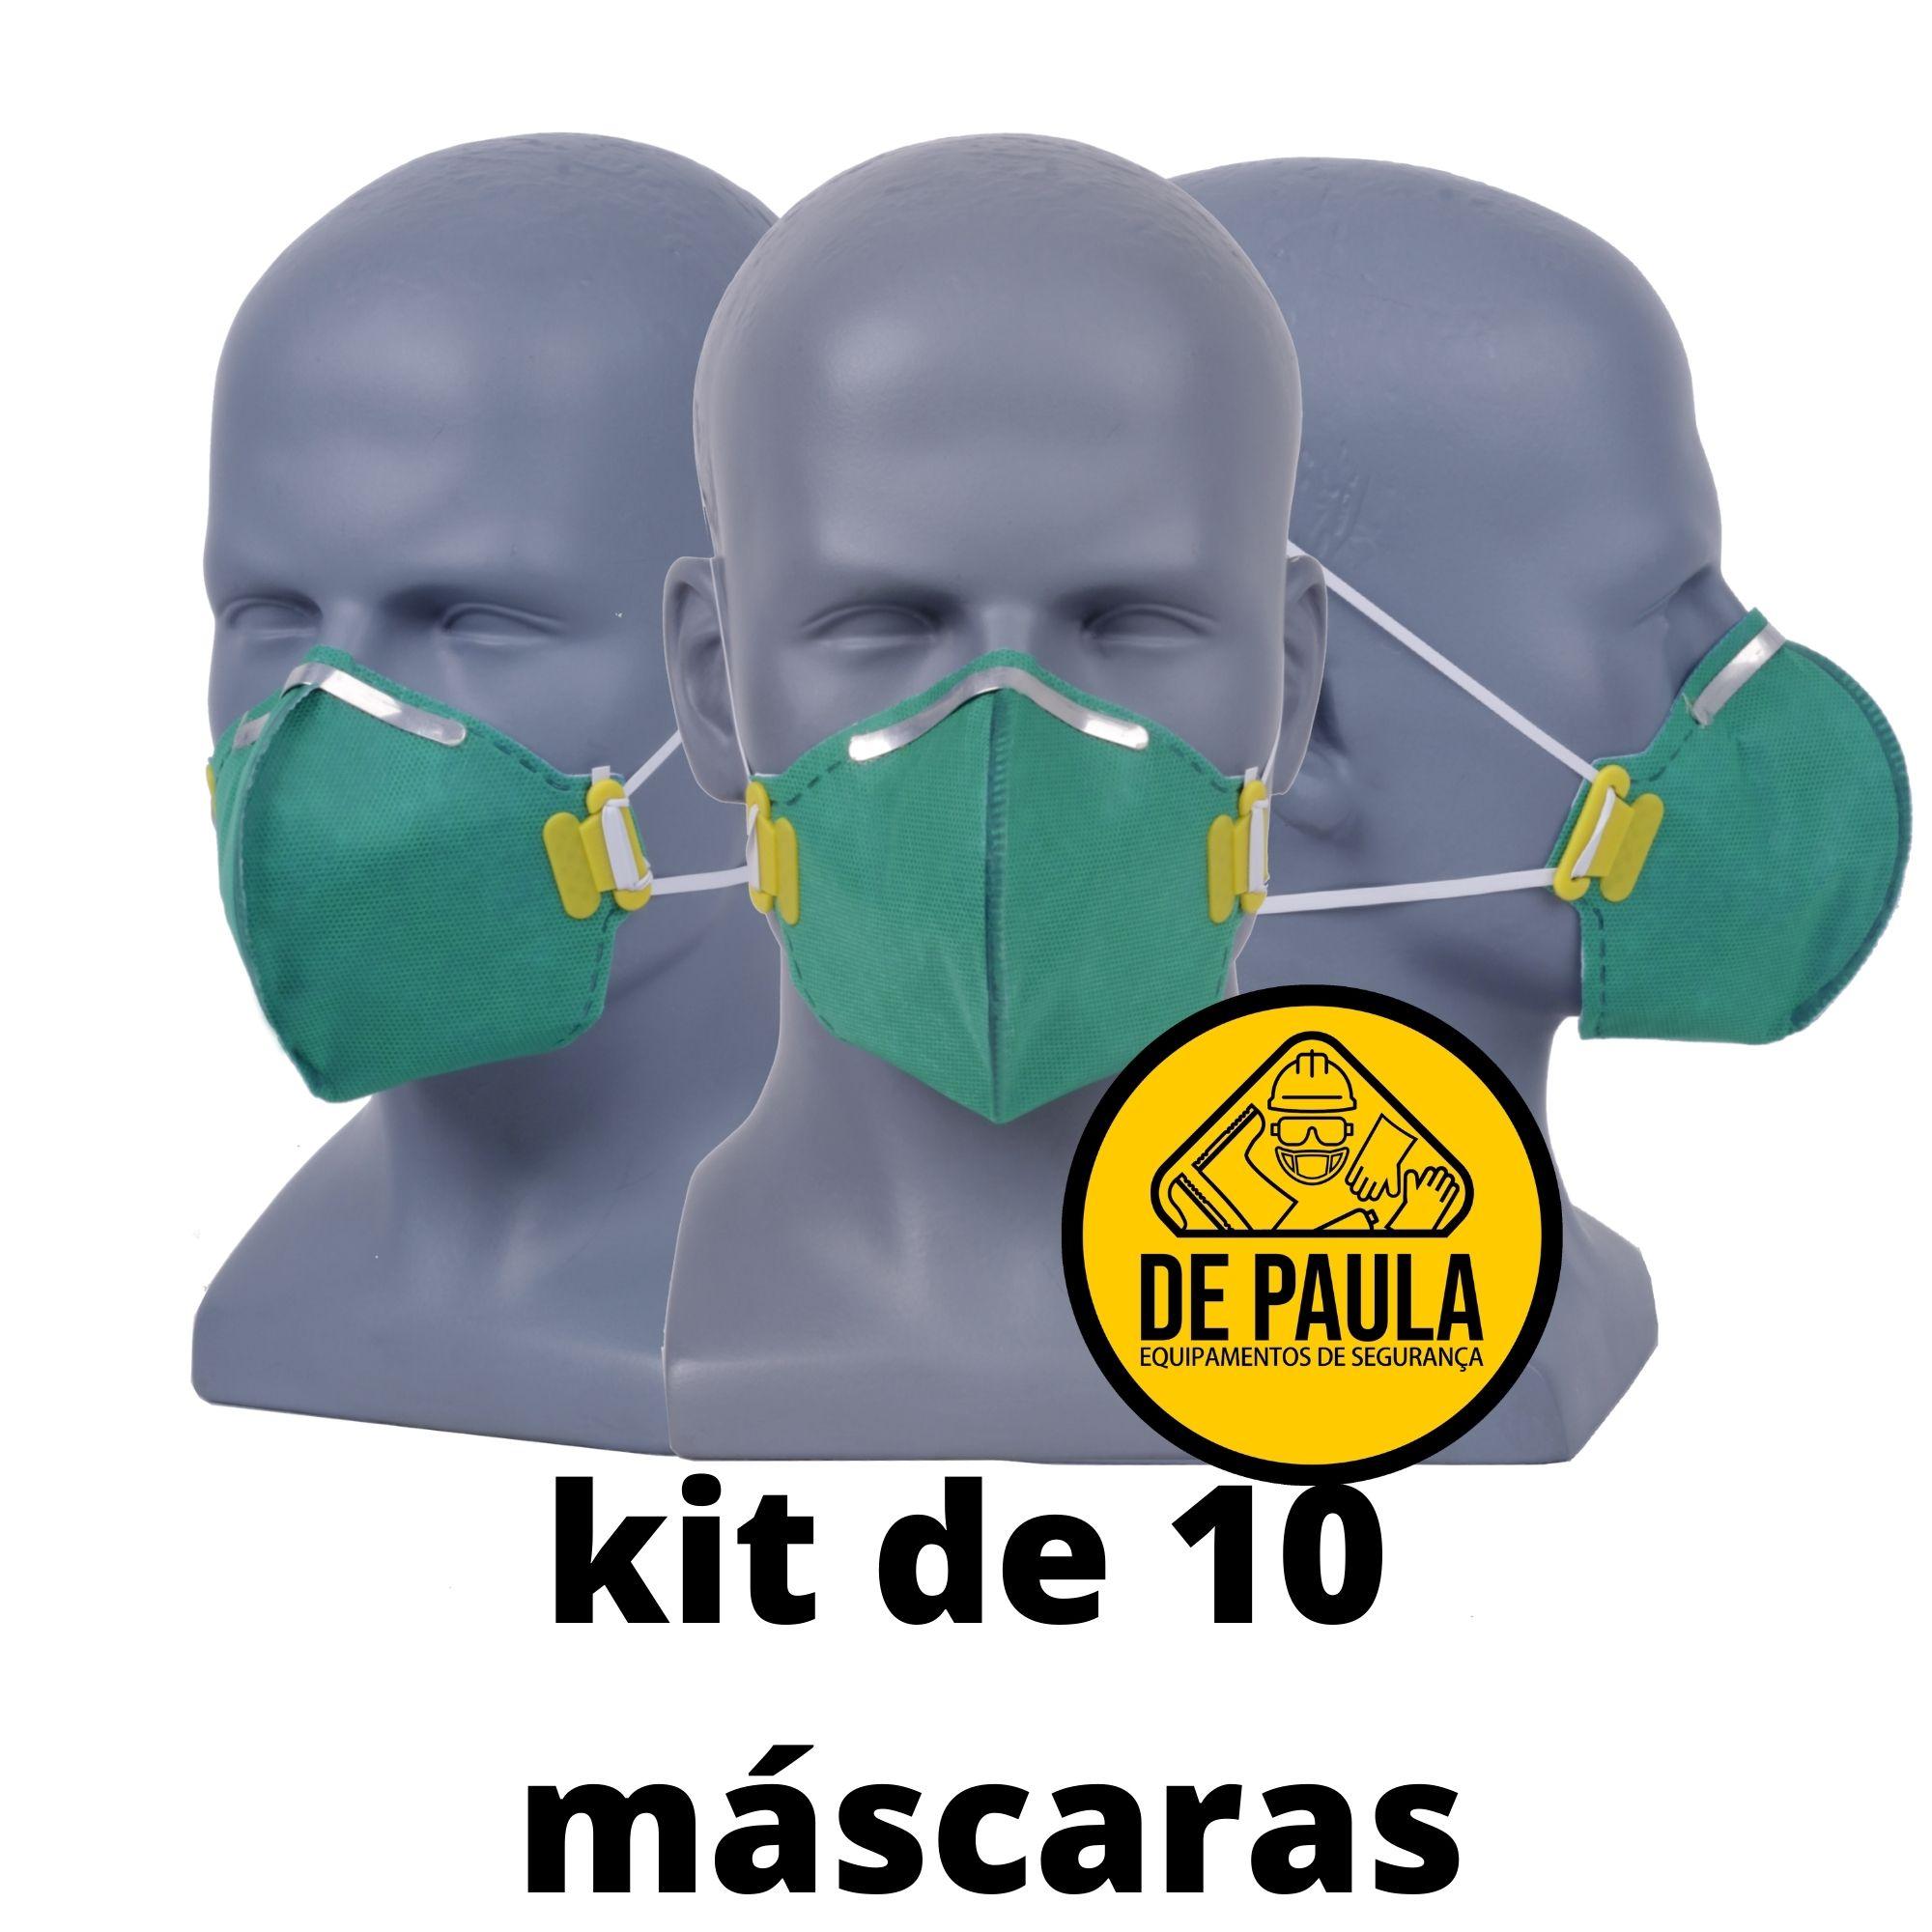 kit de 10 unidades de MÁSCARA DESCARTÁVEL PFF3 SEM VÁLVULA VERDE LUBEKA -CA38.834  - DE PAULA EPI